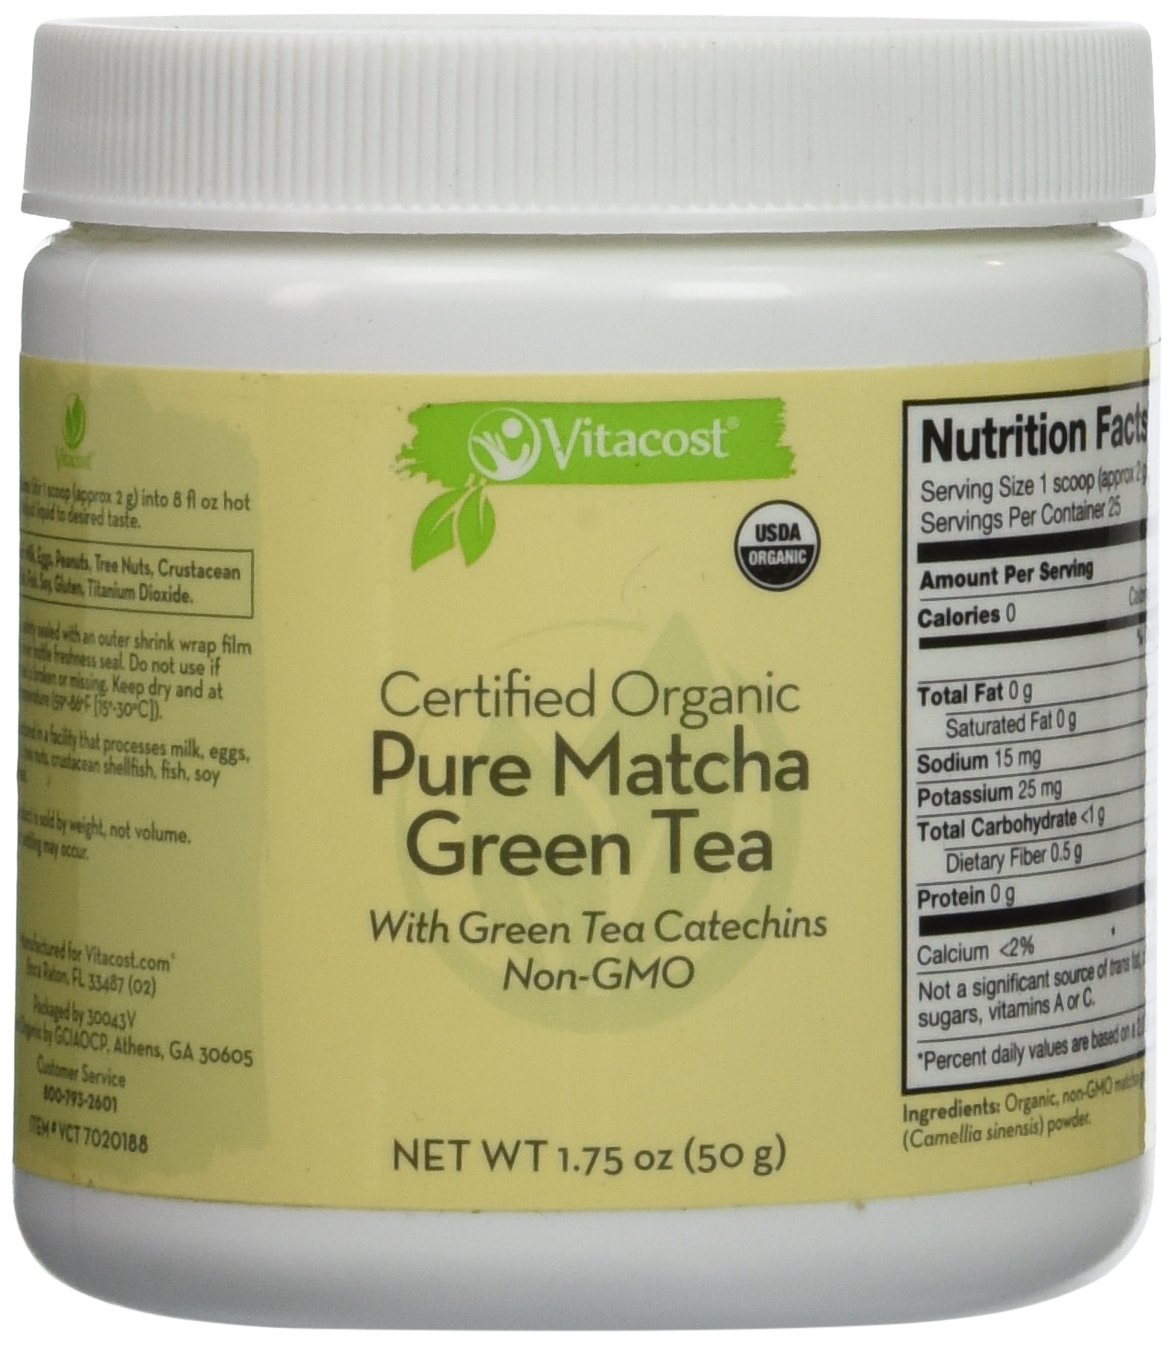 Vitacost Whole Food Certified Organic Pure Matcha Green Tea - Non-GMO - 1.75 oz (50 g)